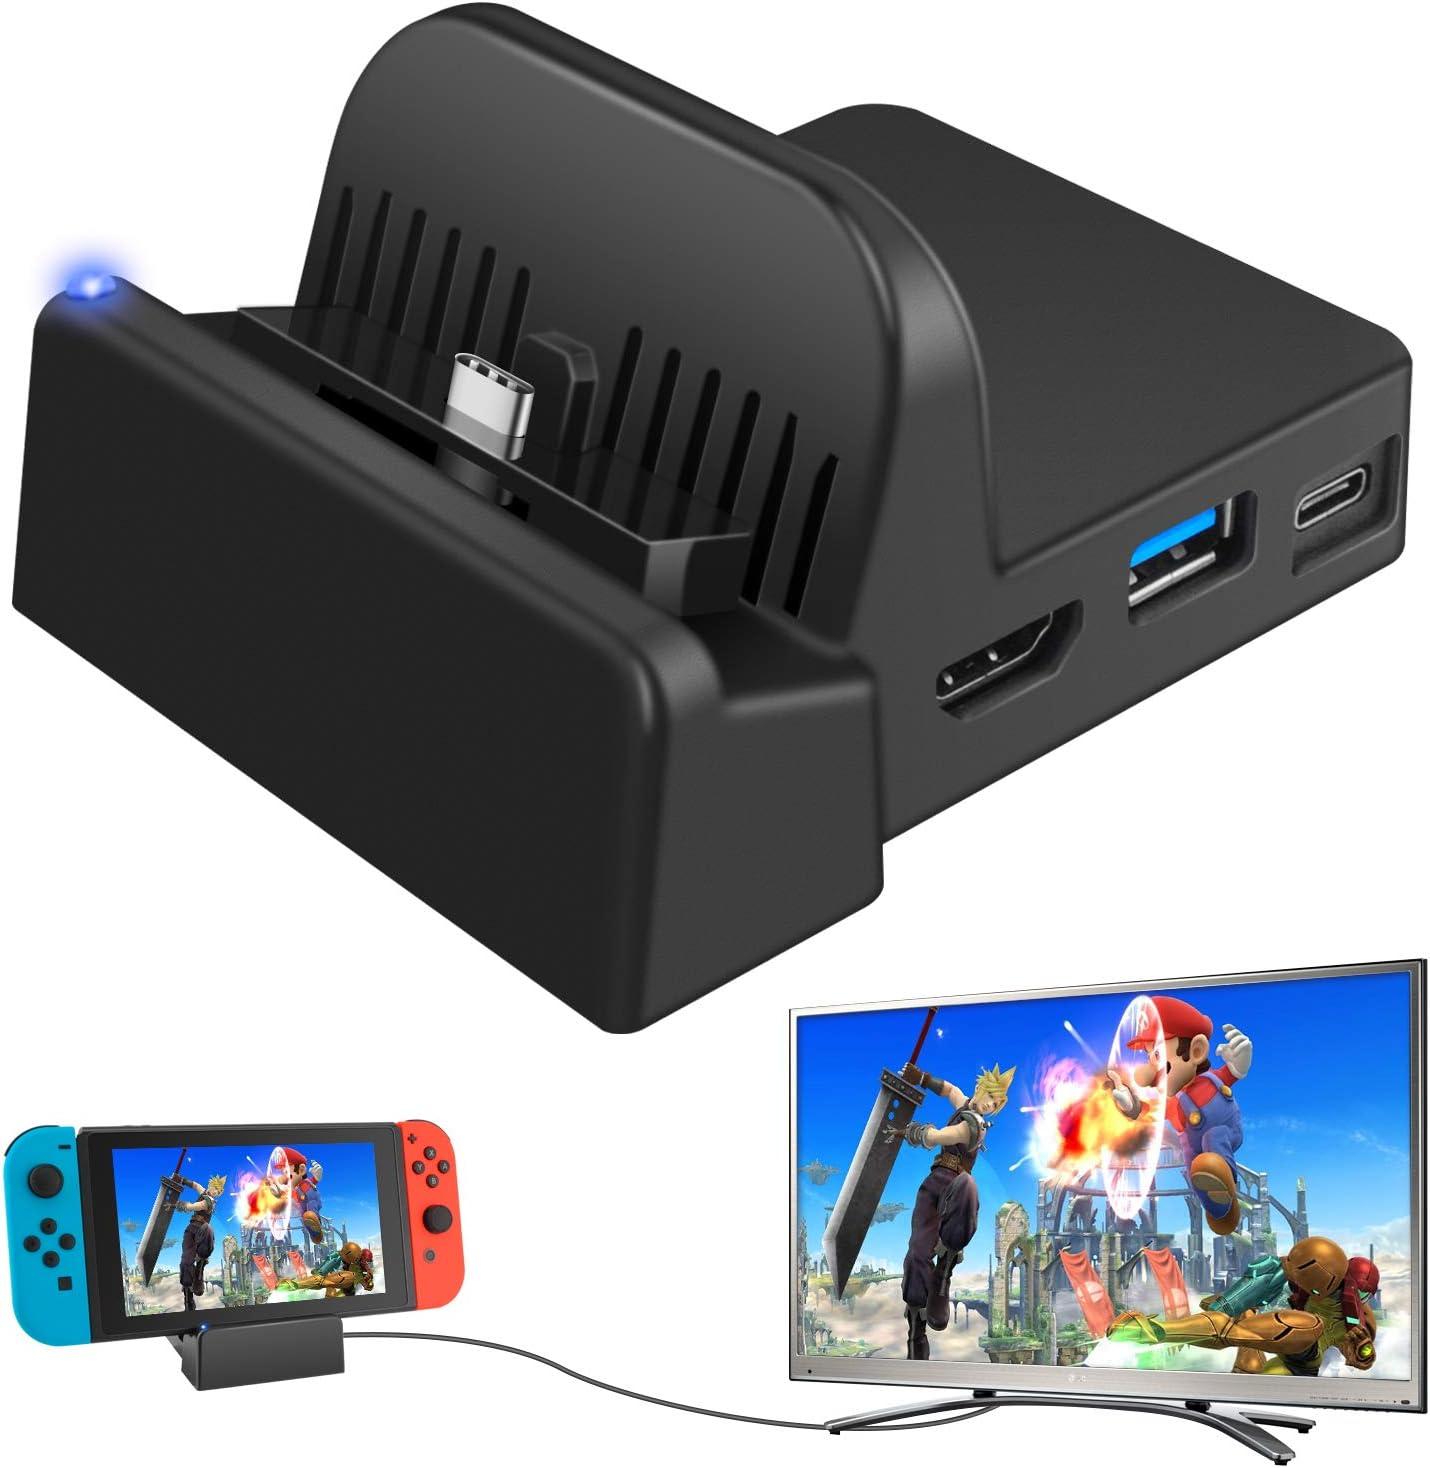 Ponkor Base de Carga para Nintendo Switch, Mini Switch TV Dock Soporte de Carga, Protable Adaptador HDMI Reemplazo de Carga para Nintendo Switch con USB 3.0 LED Light